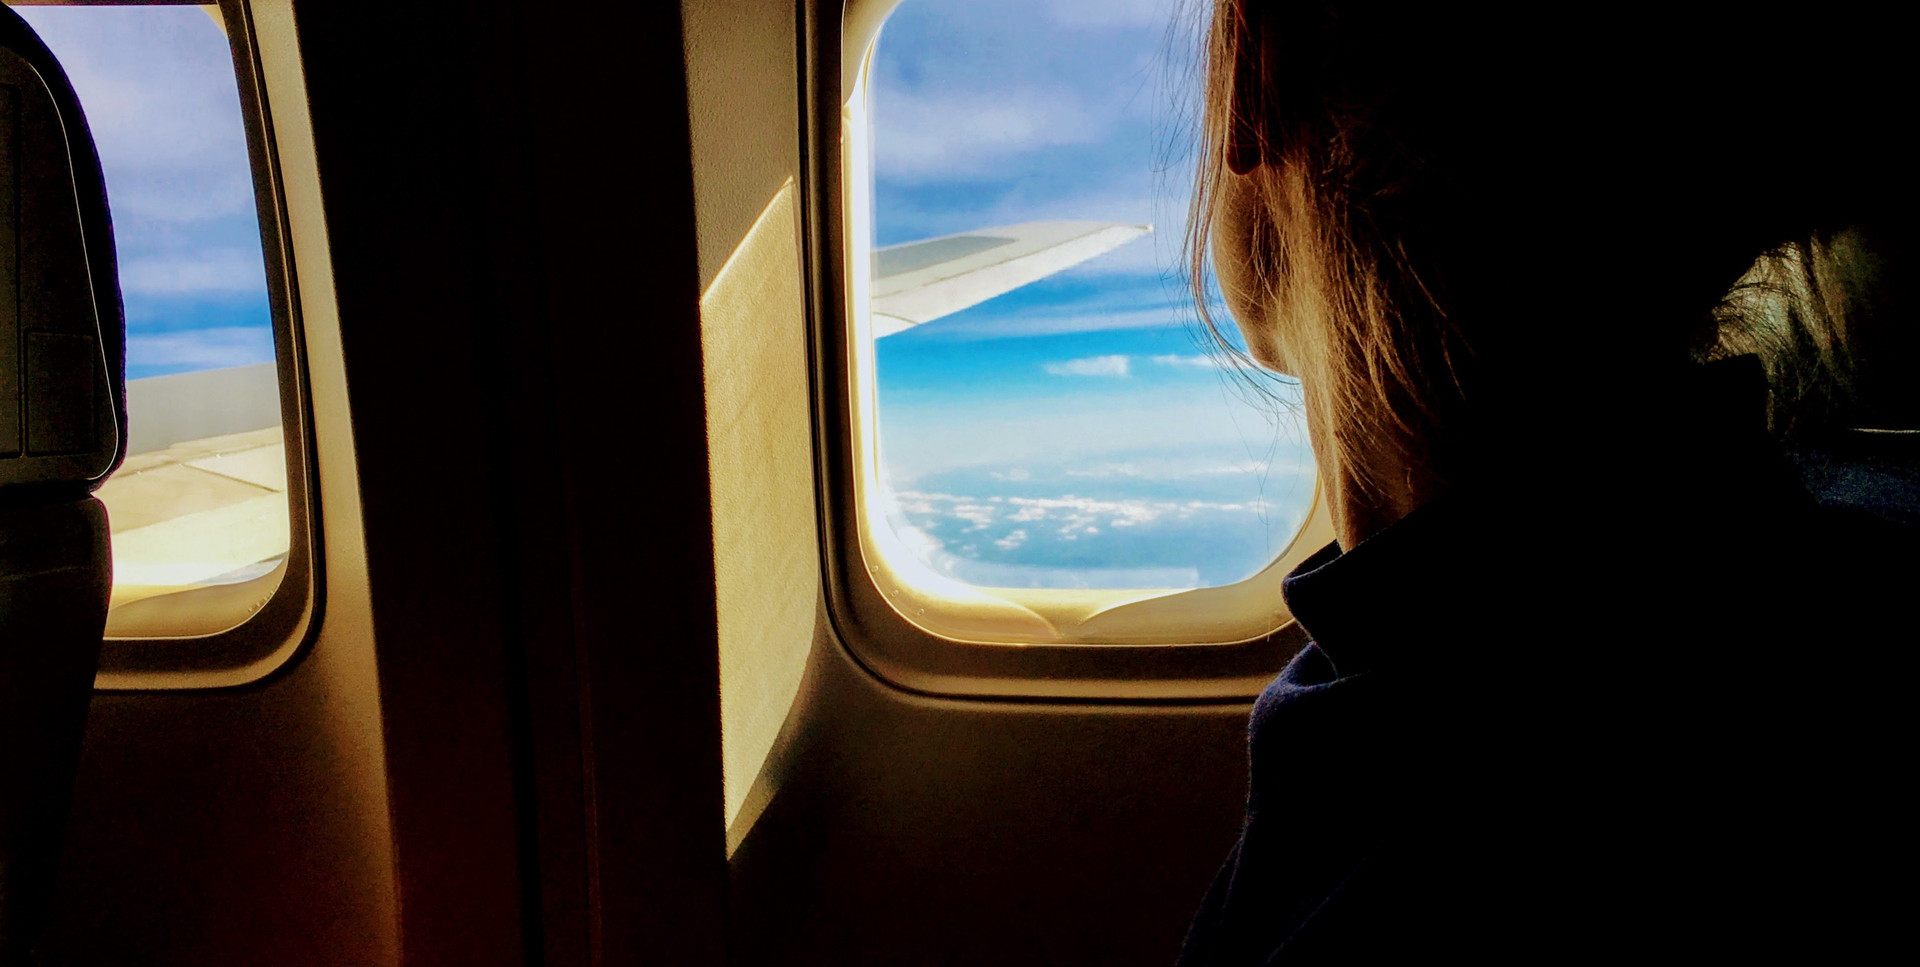 adult-adventure-aircraft-443430.jpg